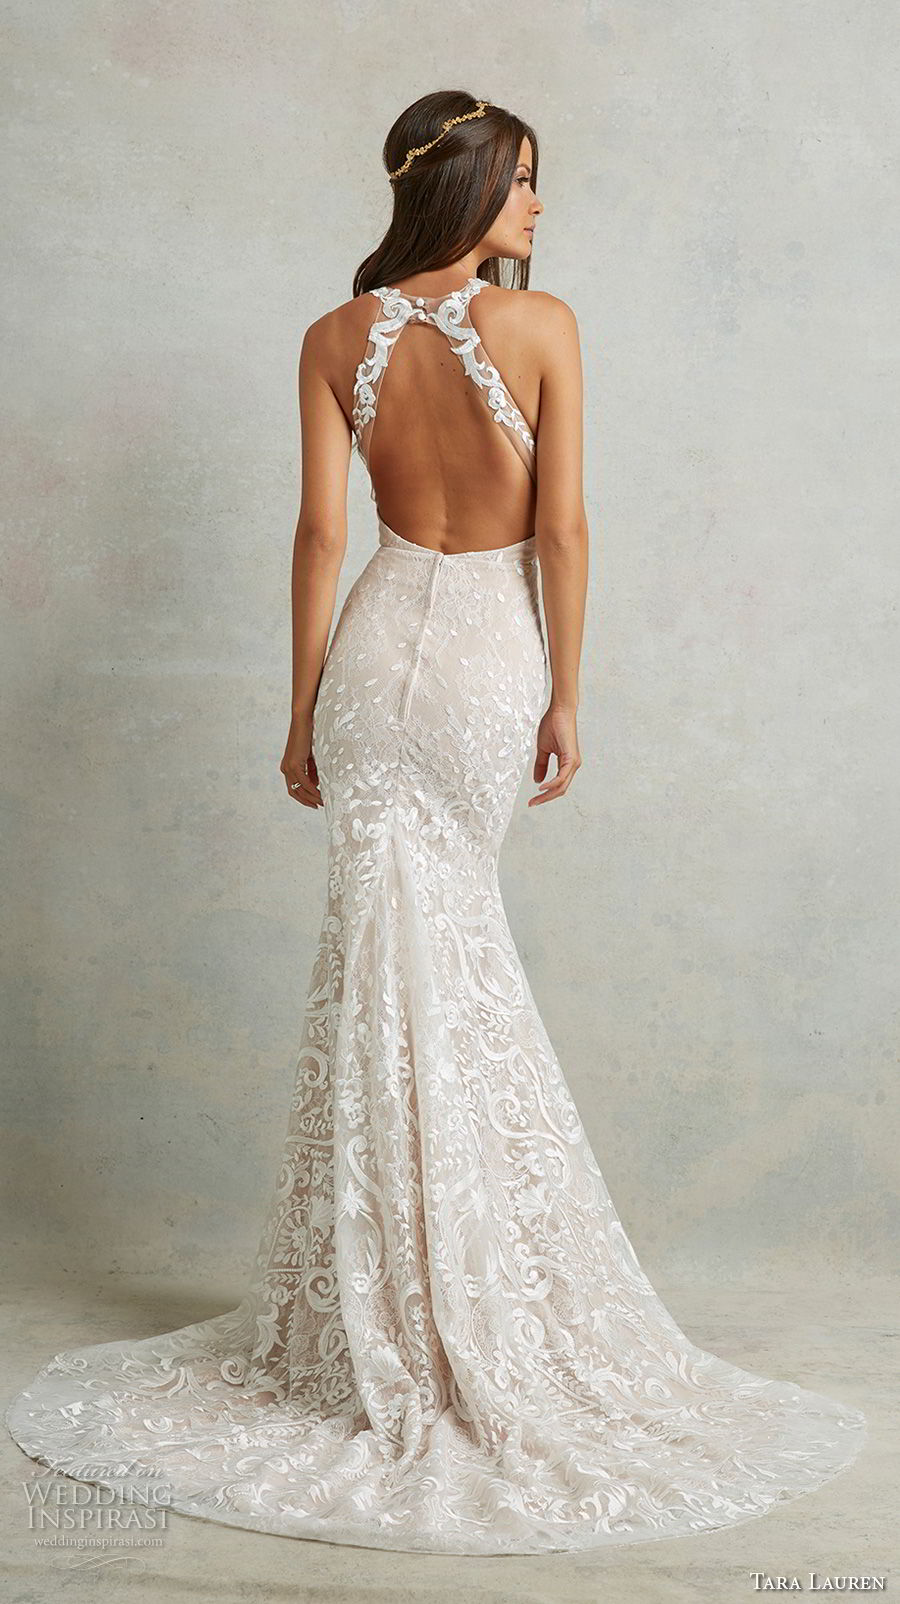 Tara Lauren Spring 2018 Wedding Dresses Wedding Inspirasi